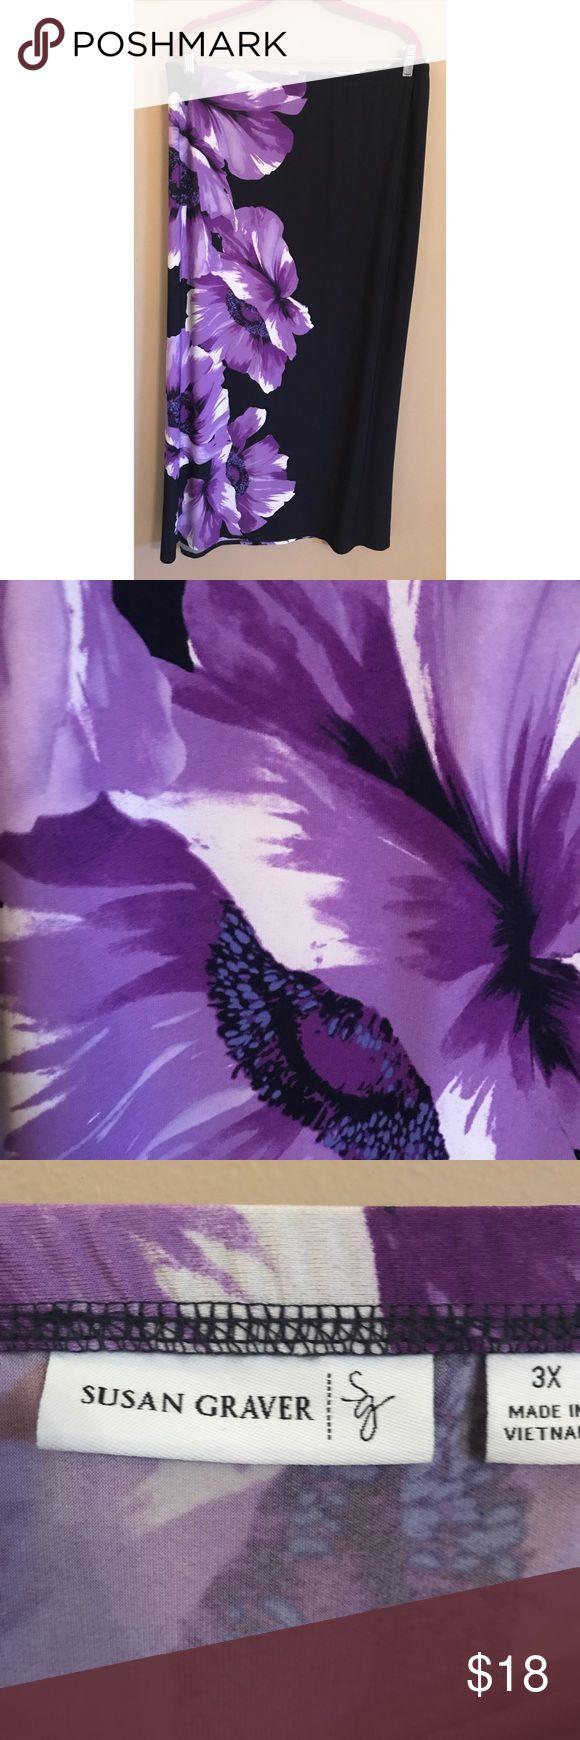 Susan Graver Purple Floral Maxi Skirt Size 3X Susan Graver Black and Purple Floral Maxi Skirt. Size 3X. Left side slit, elastic waistband. Materials: 95% Polyester 5% Spandex. Susan Graver Skirts Maxi